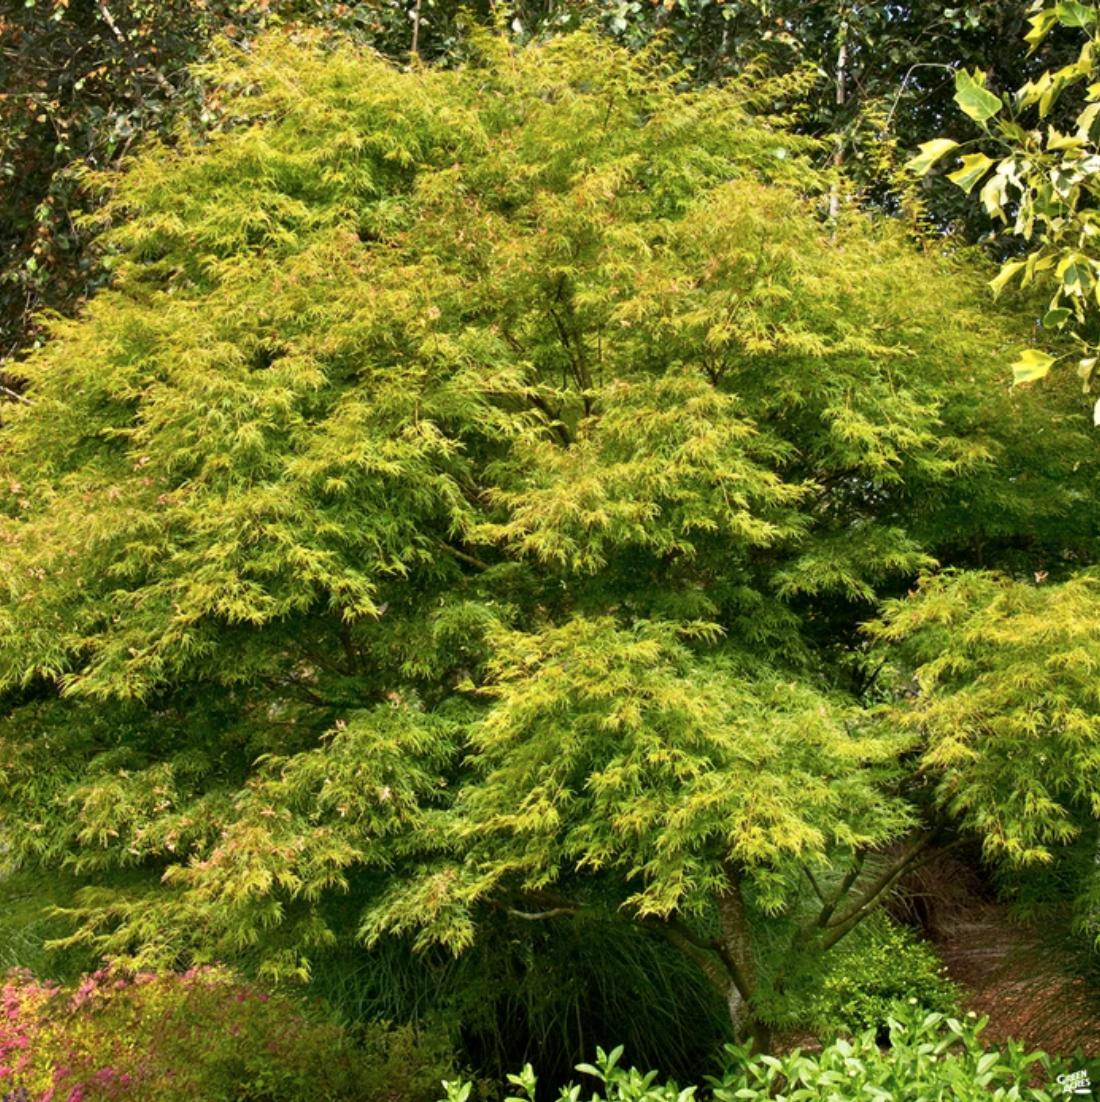 Acer palmatum var. dissectum. Photo: Green Acres Nursery.